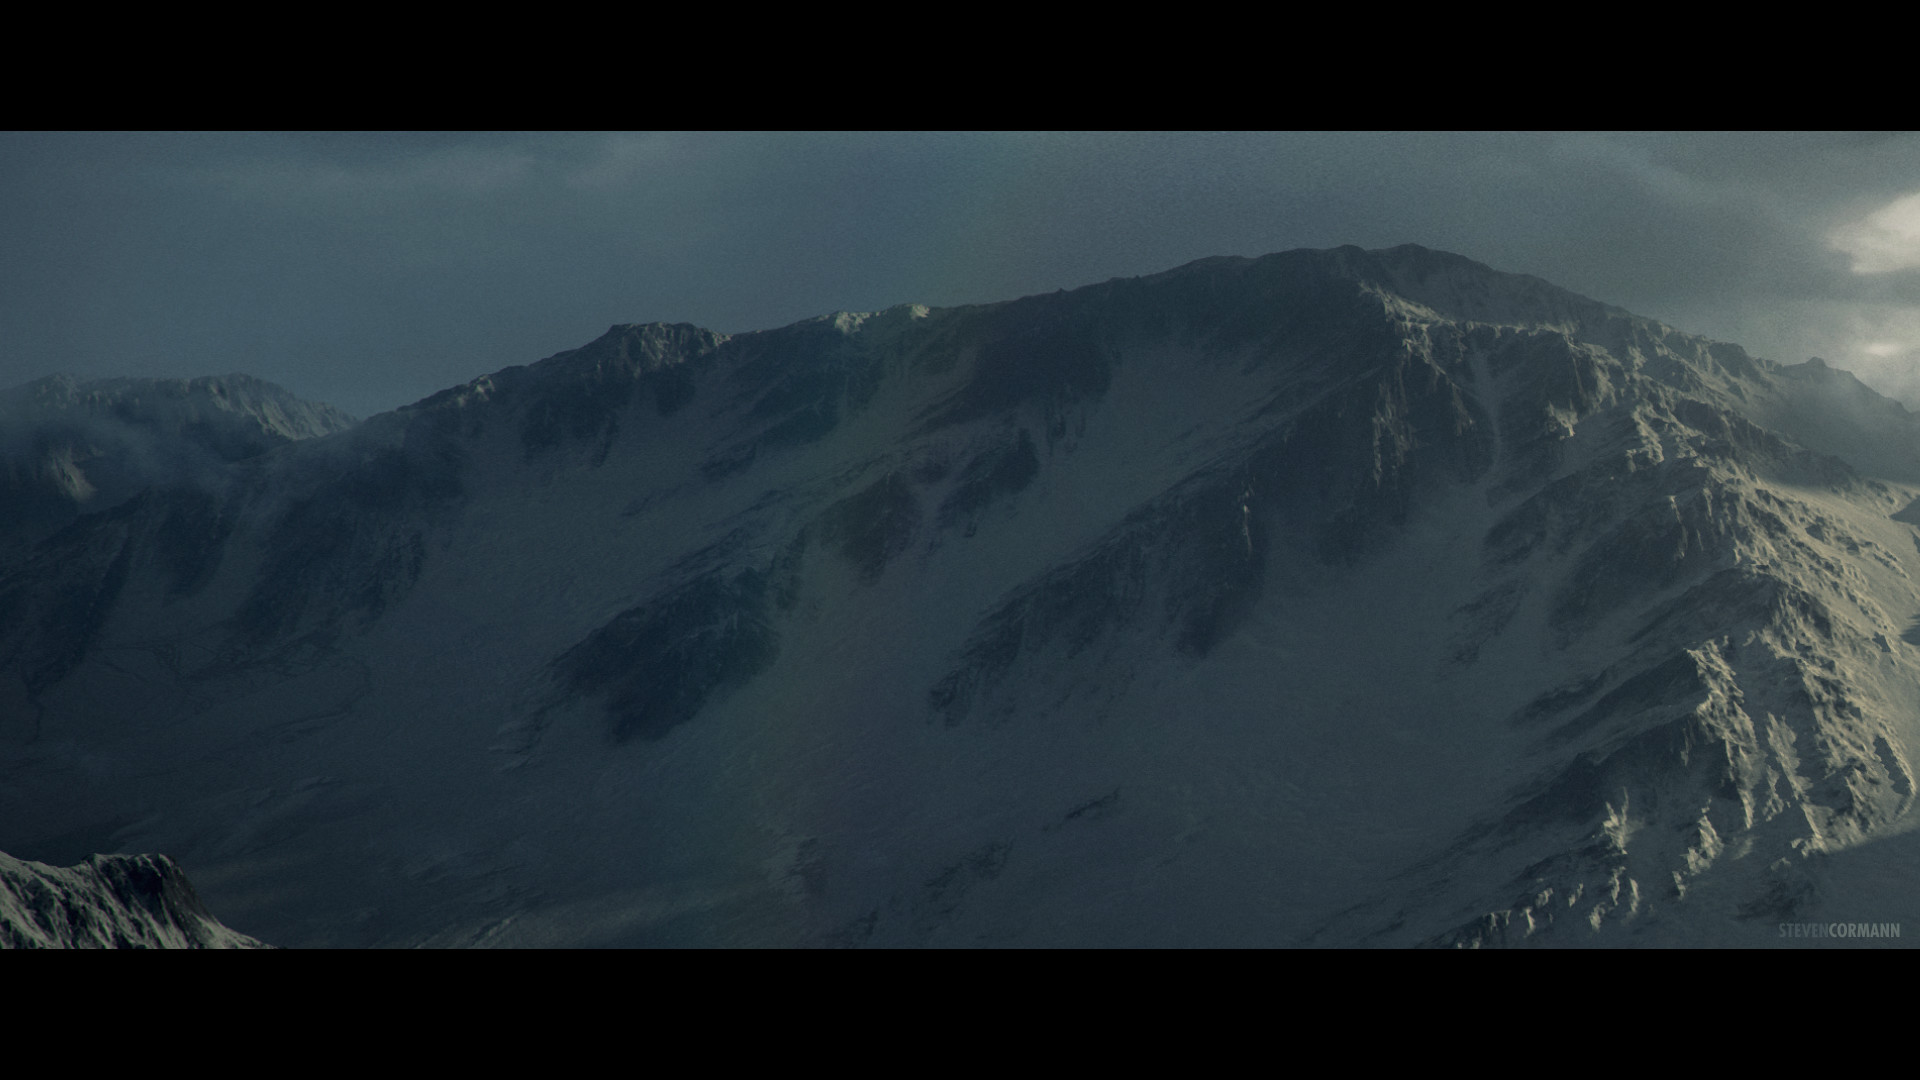 Steven cormann landscape03